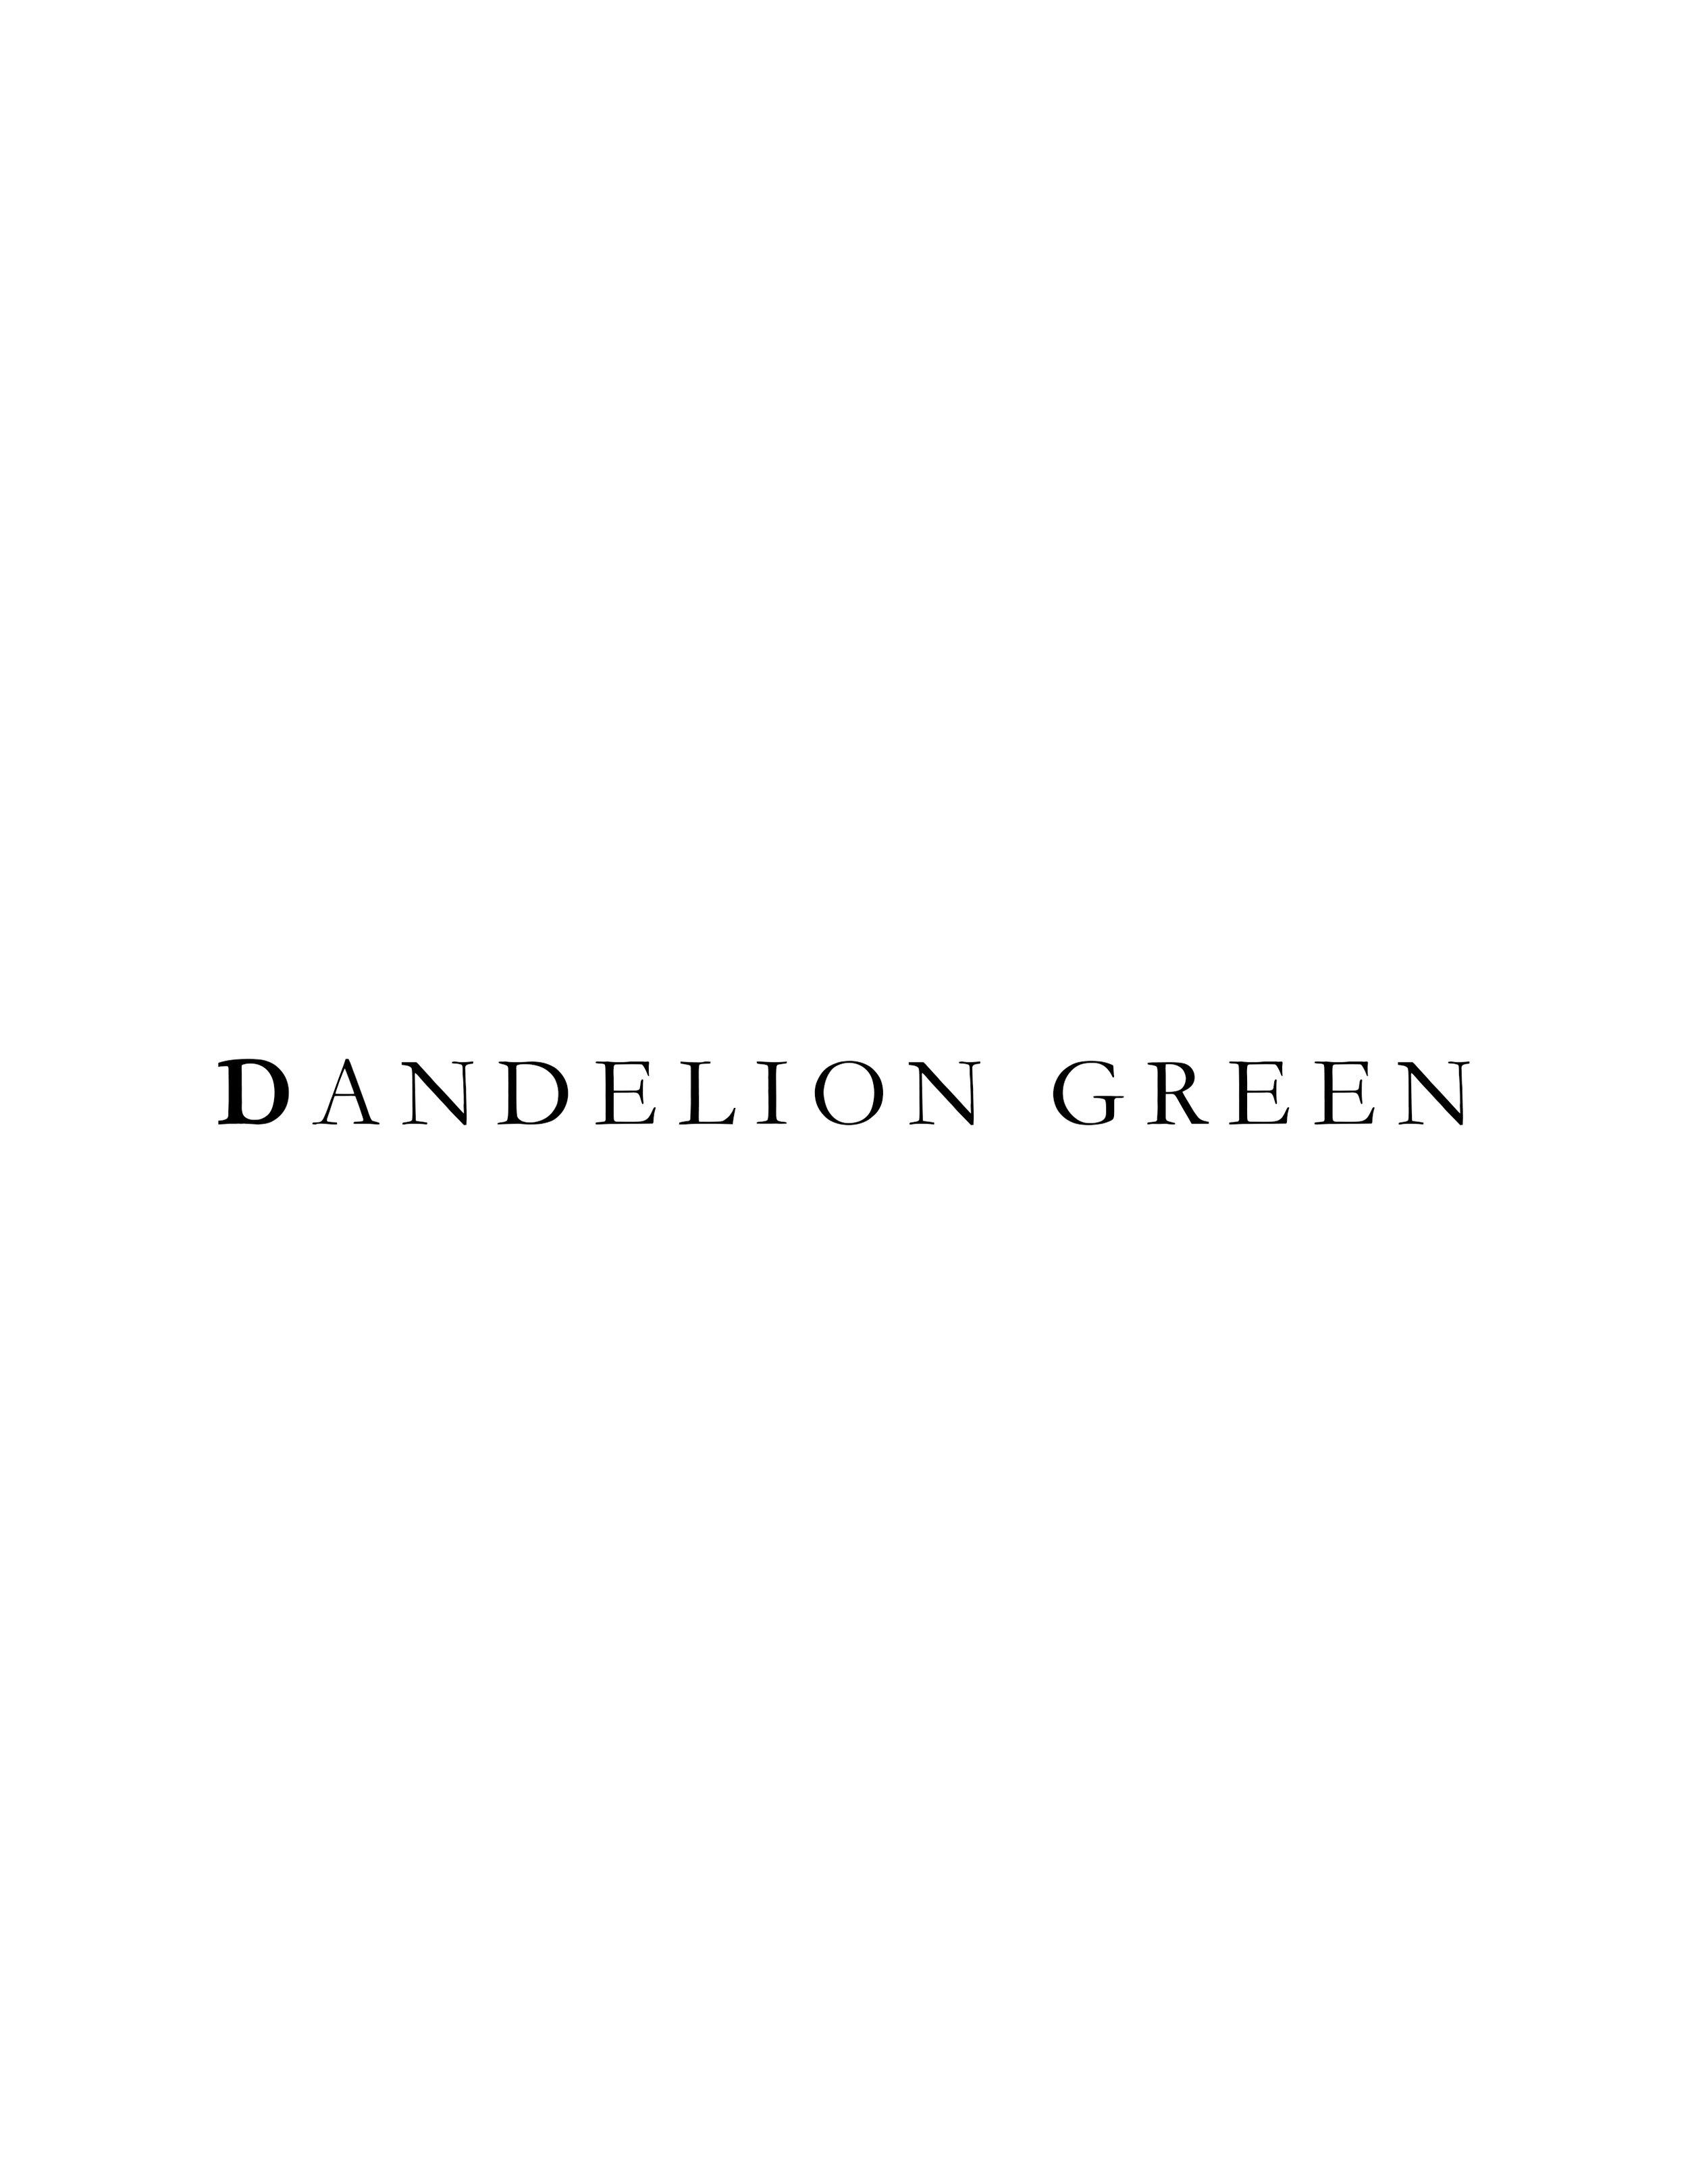 Text_Dandelion.jpg